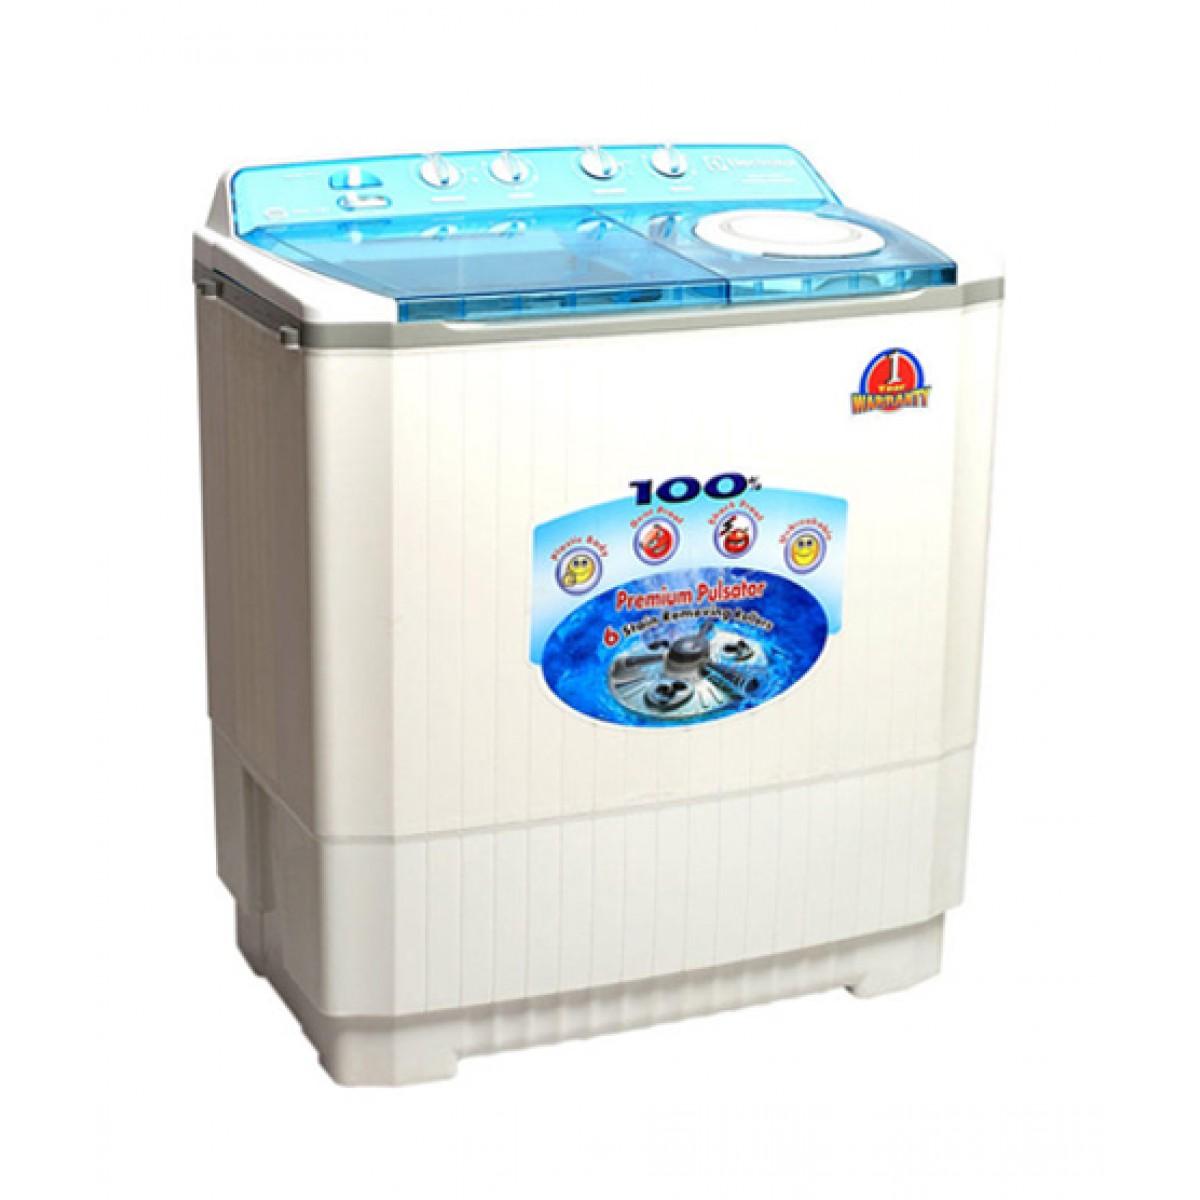 Electrolux Top Load Washing Machine (SEW-7020)